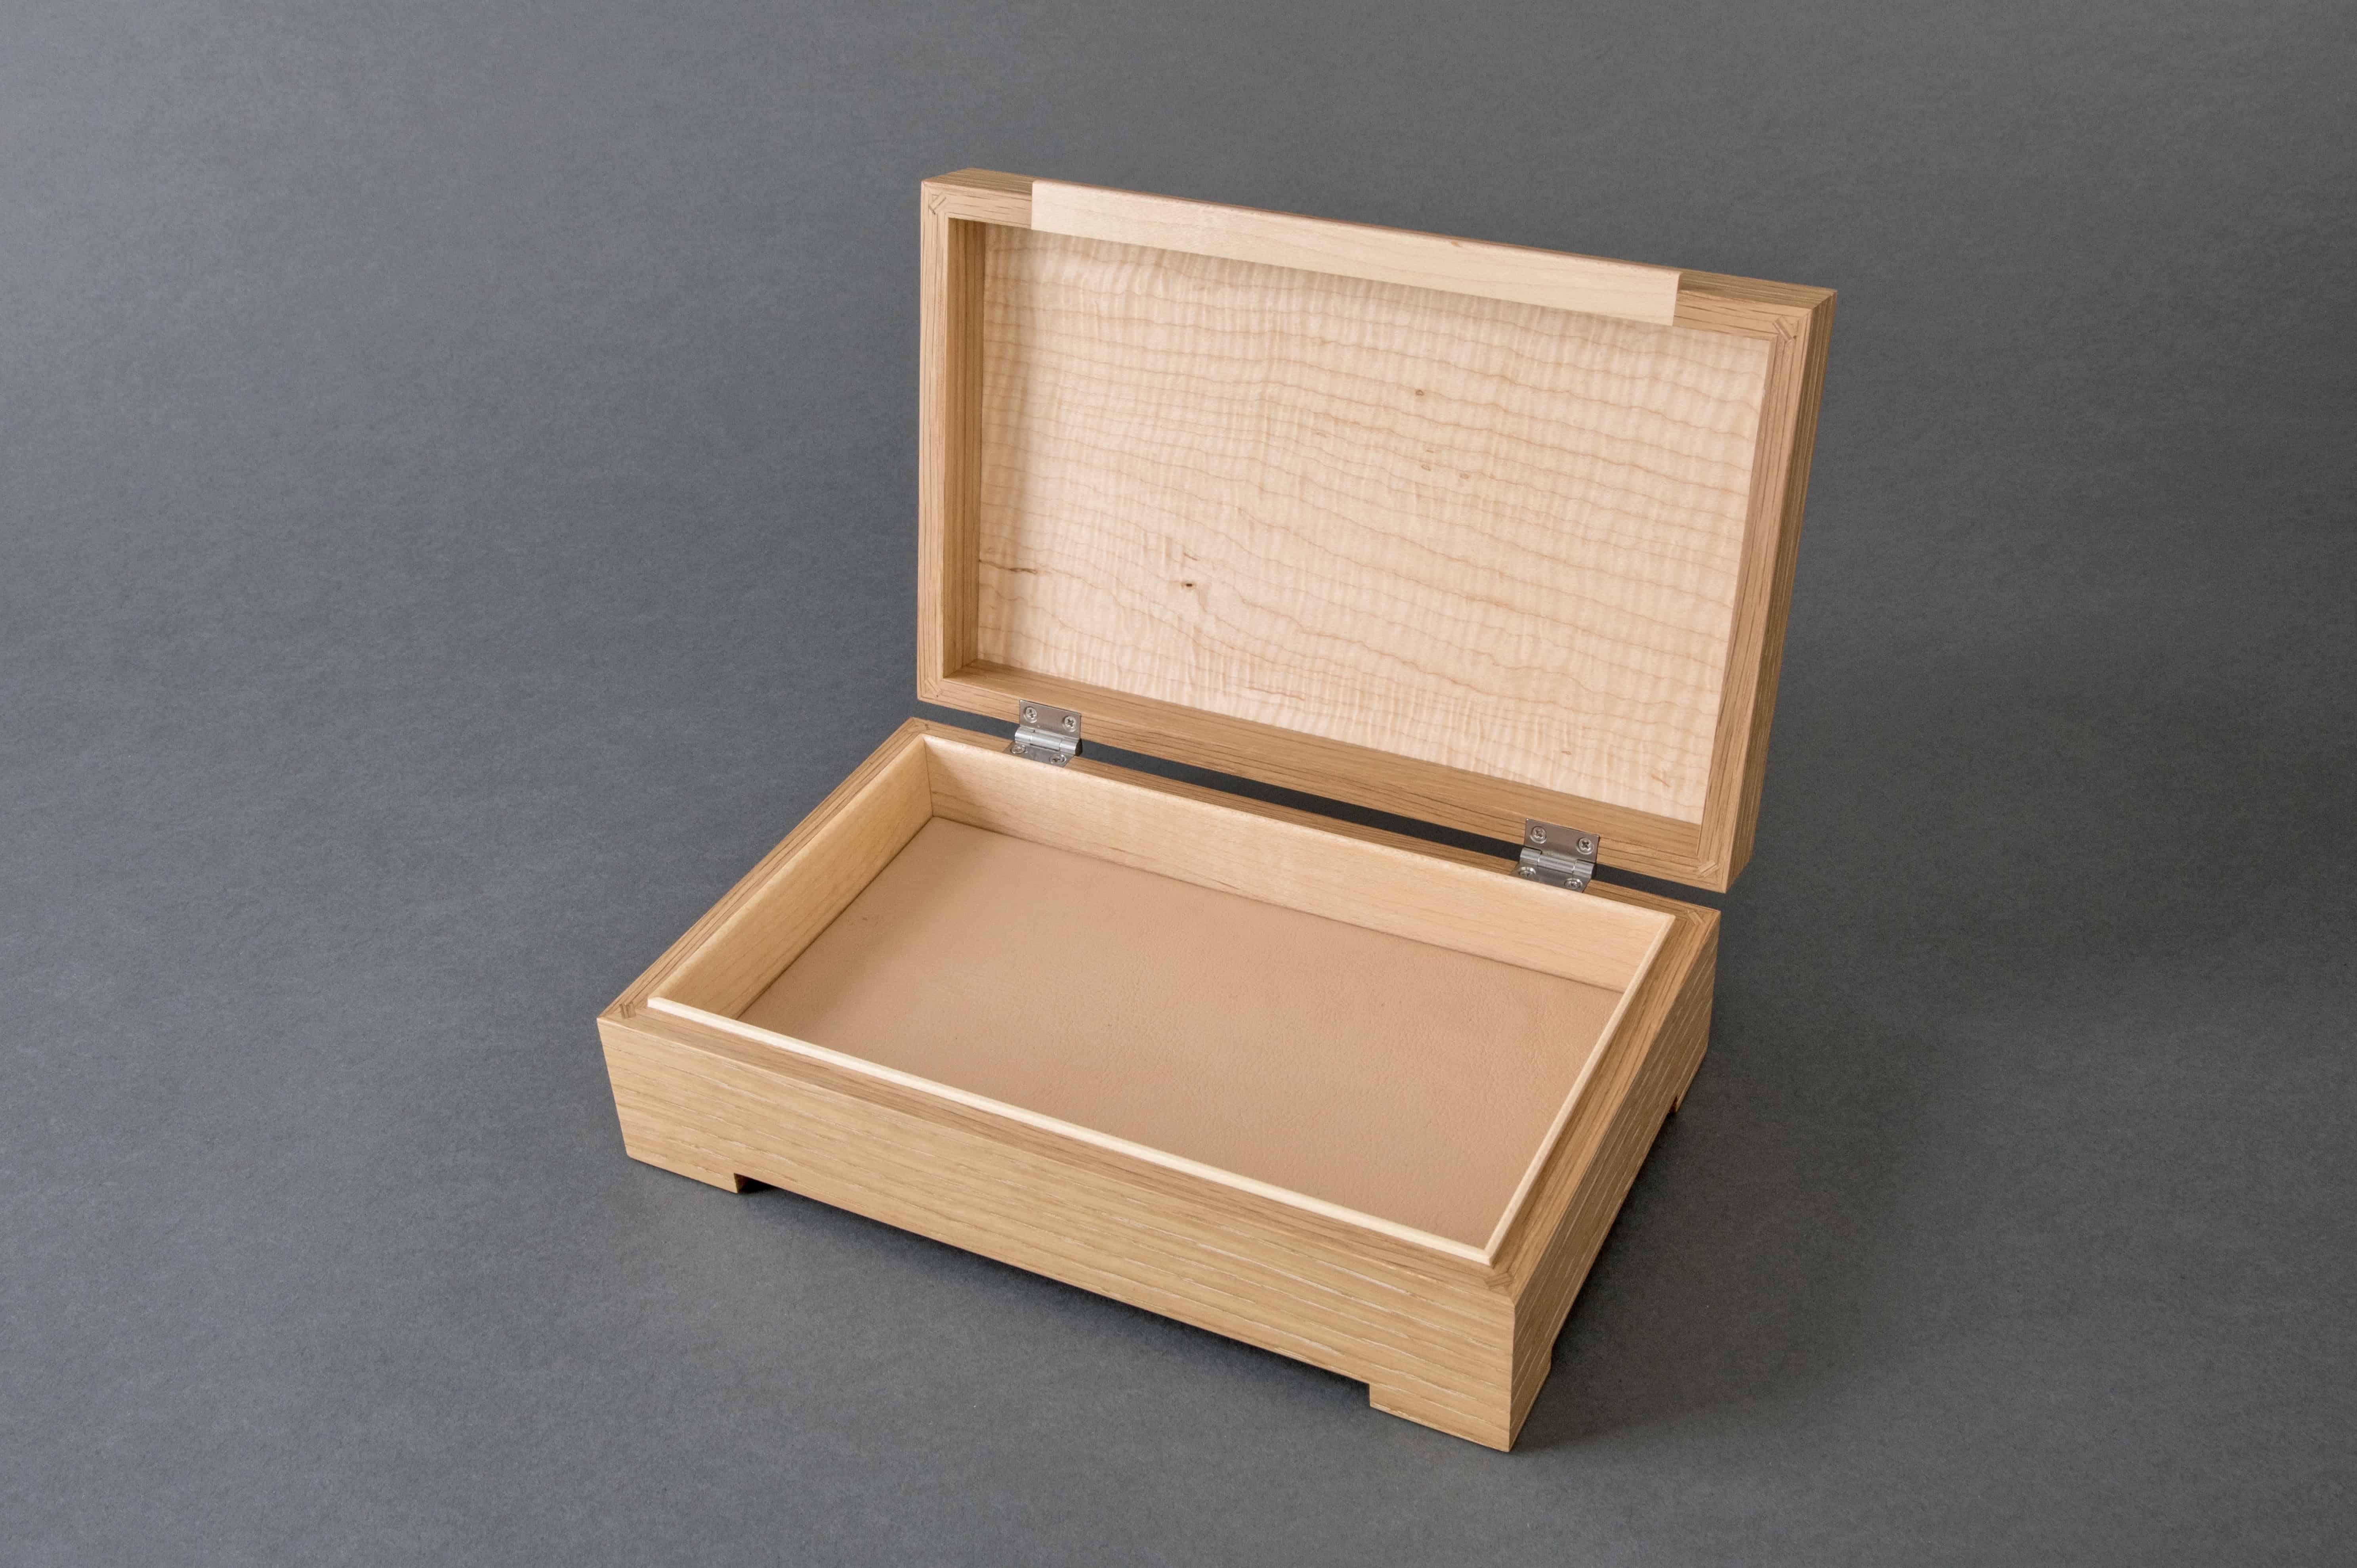 WhiteOak and Maple Grid Jewelry Box